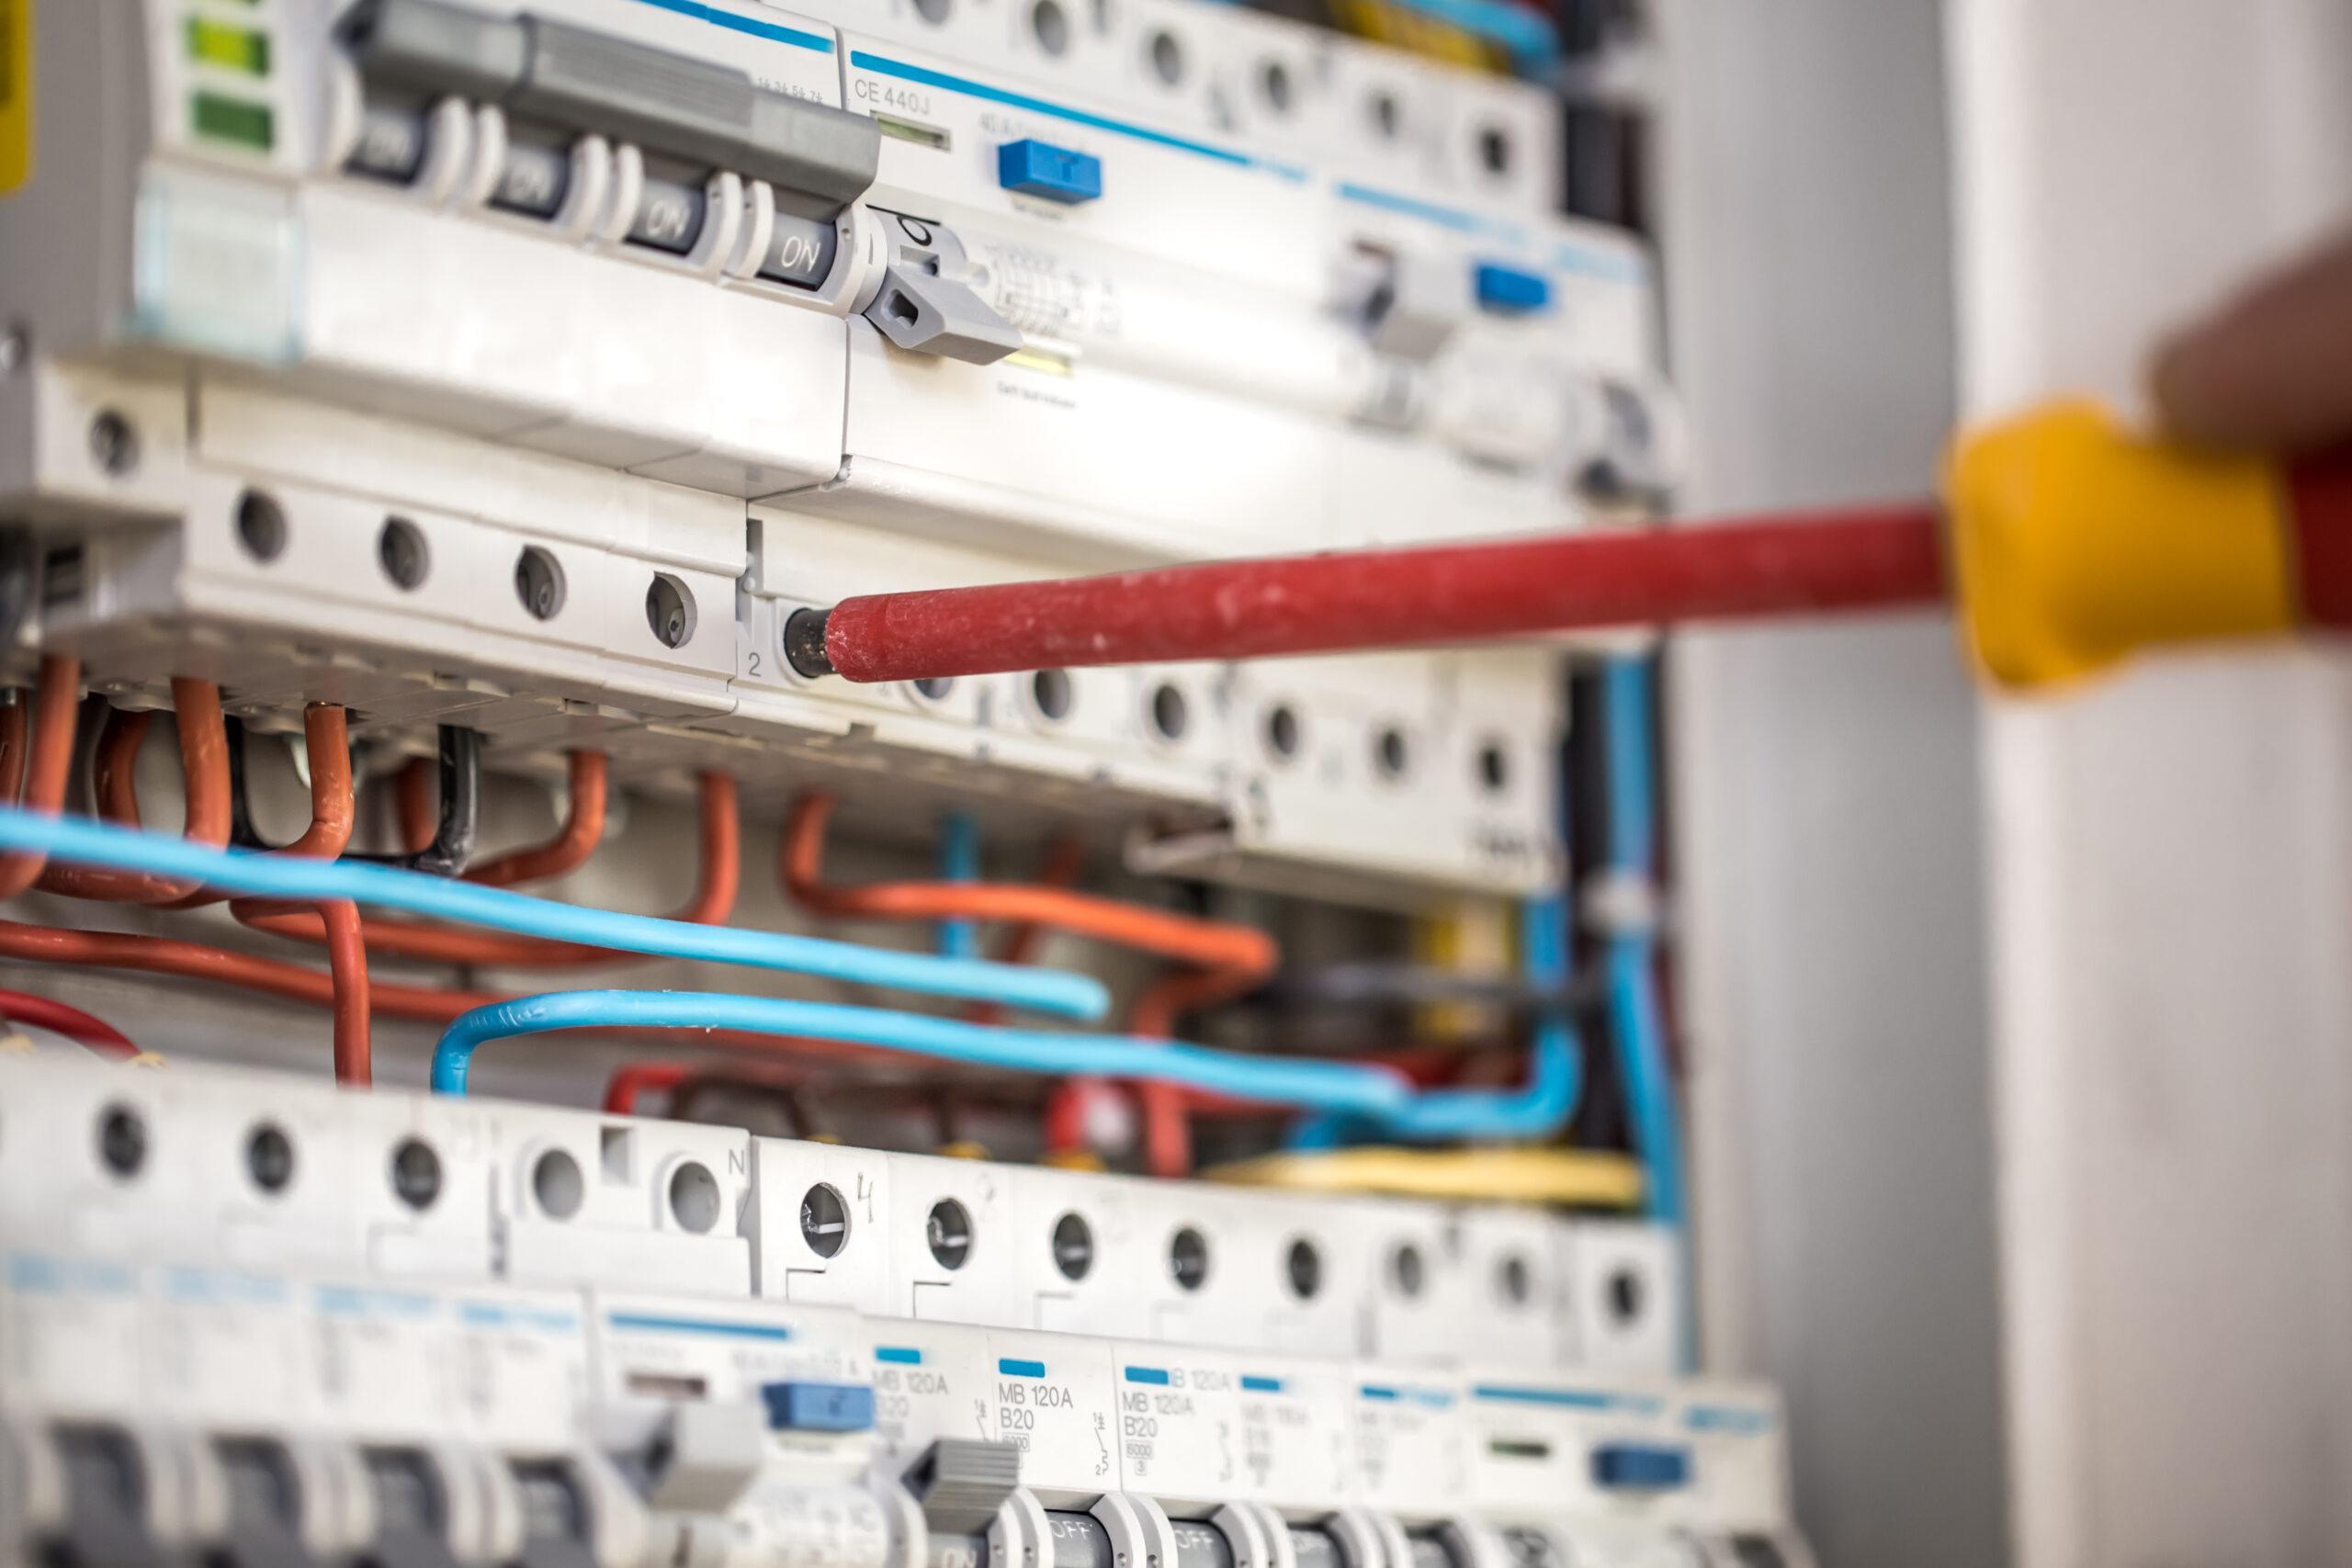 man-an-electrical-technician-working-in-a-switchbo-GW5HTSZ